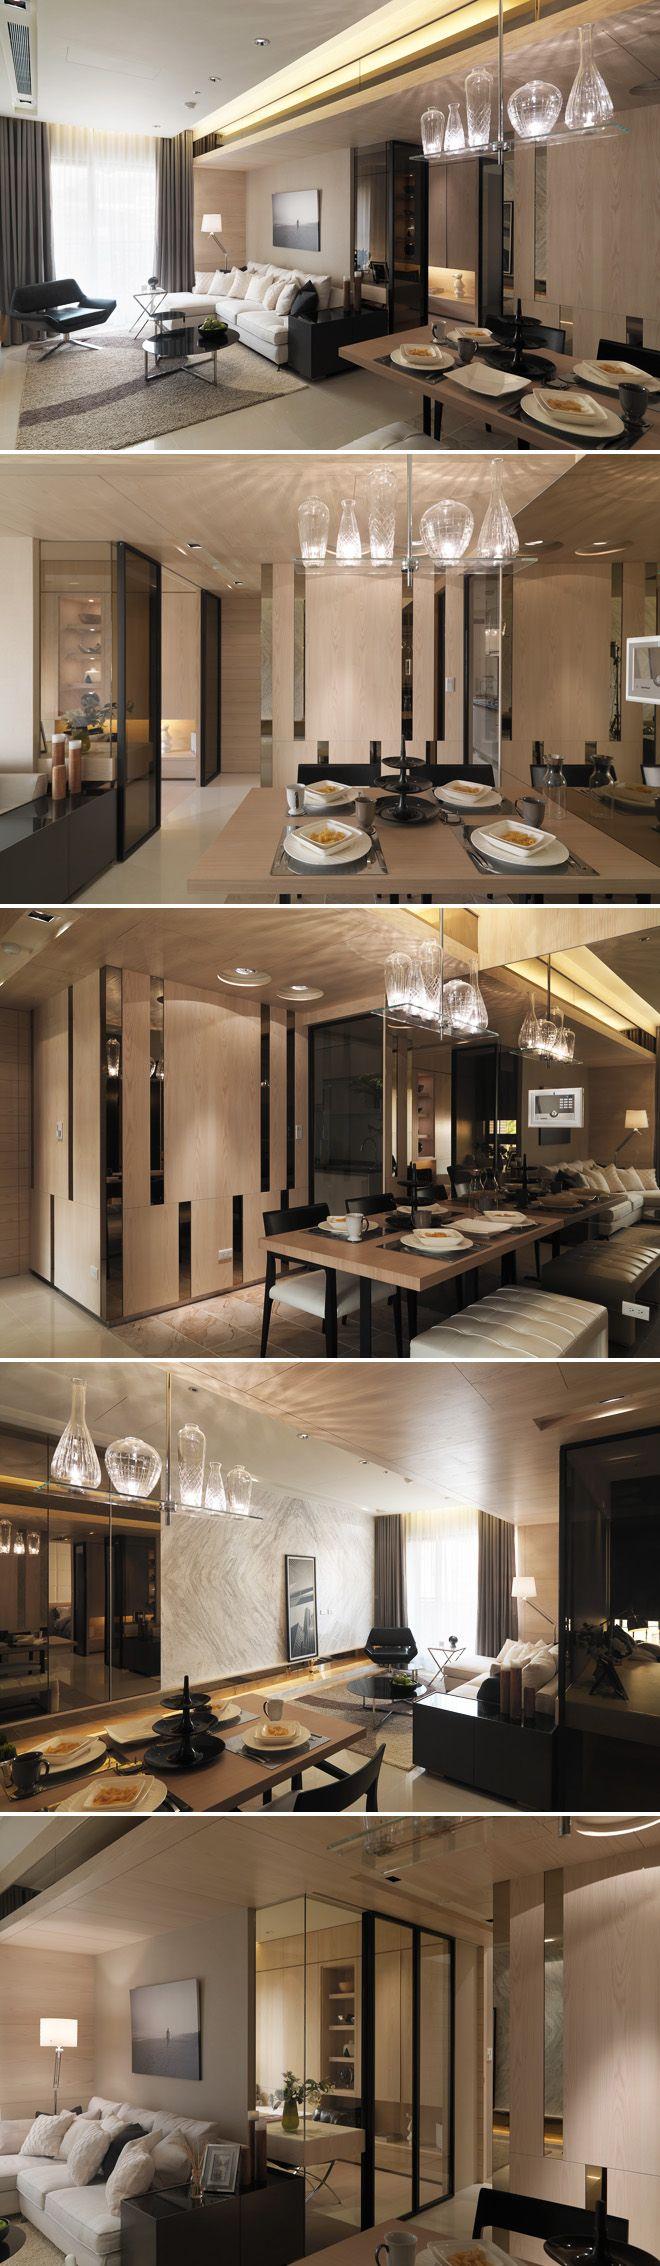 Contemporary Design + Architecture Interior ::Fantasia interior